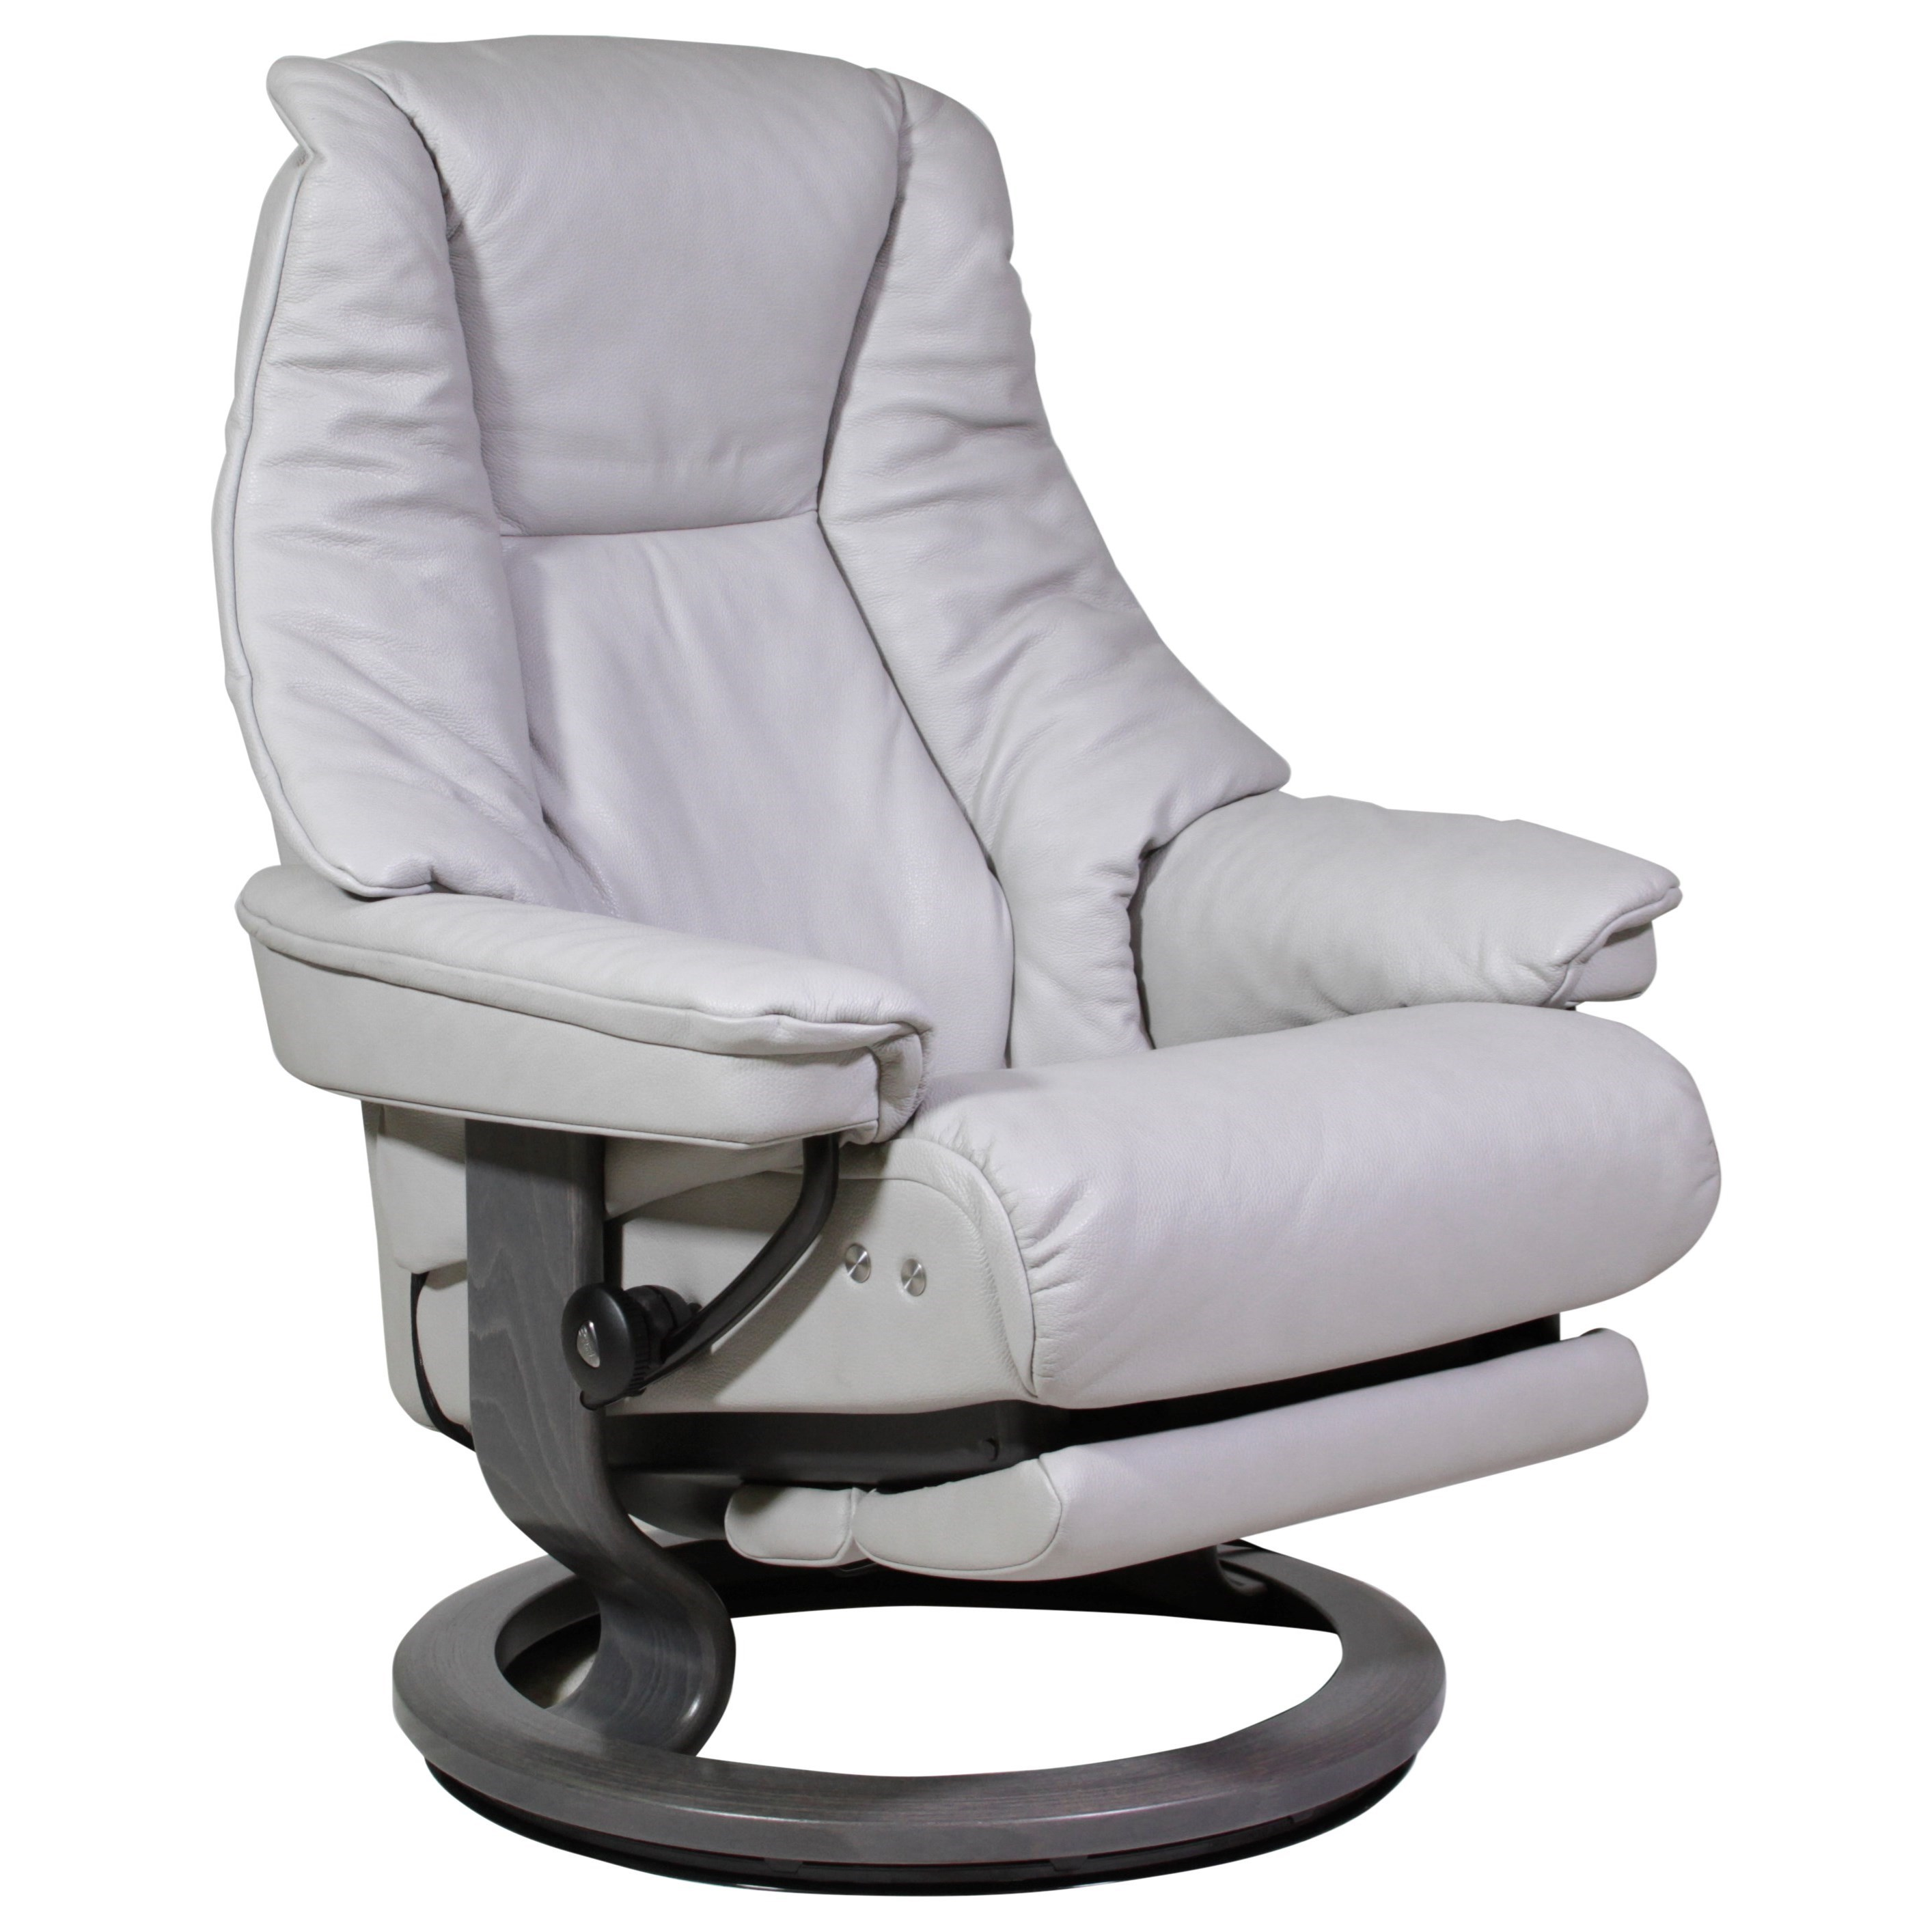 stressless live 1319715 medium legcomfort recliner john v schultz furniture three way recliners. Black Bedroom Furniture Sets. Home Design Ideas